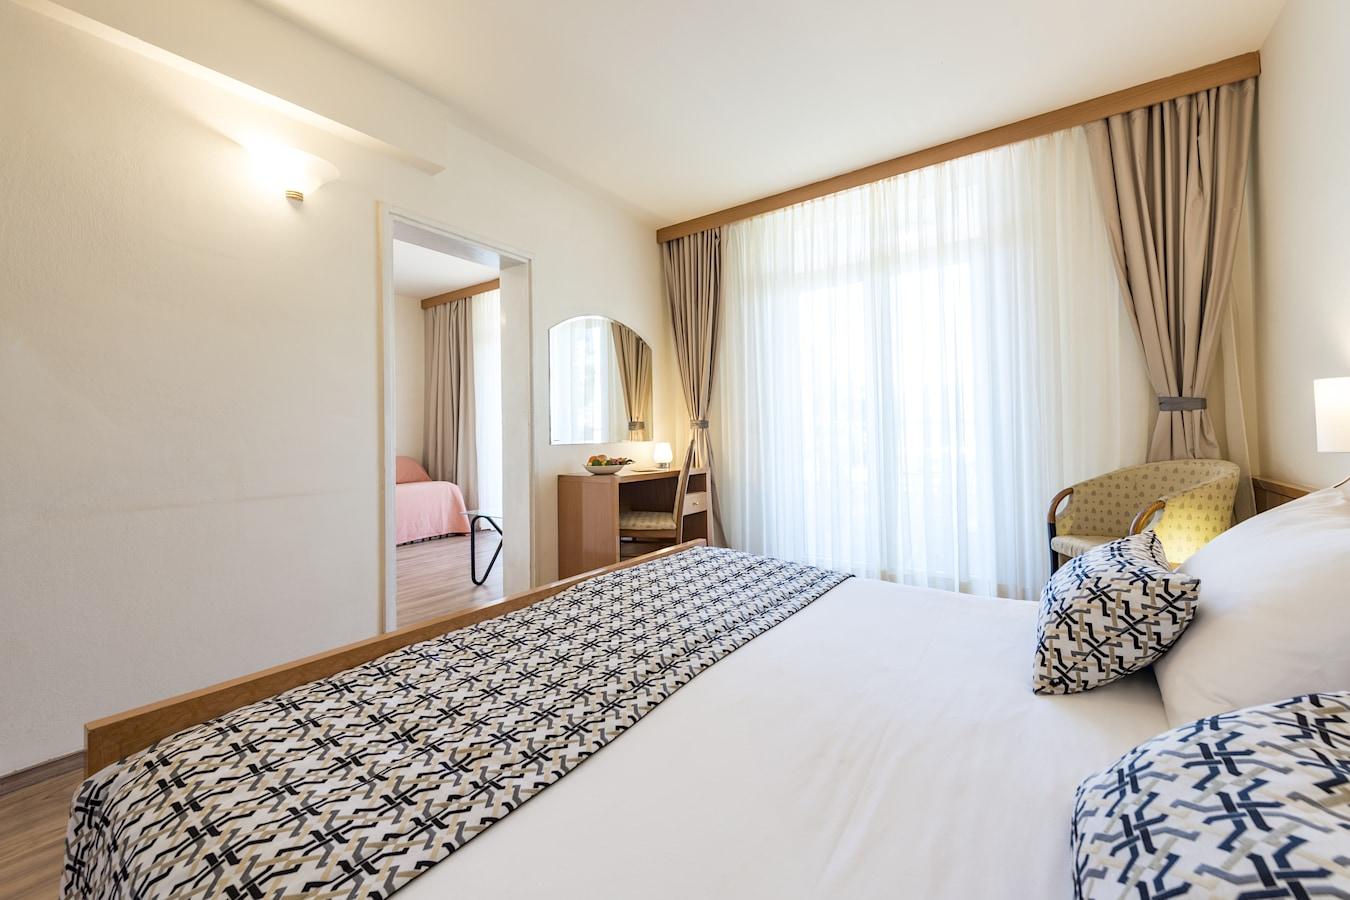 splendid-hotel-superior-room-dubrovnik.jpg